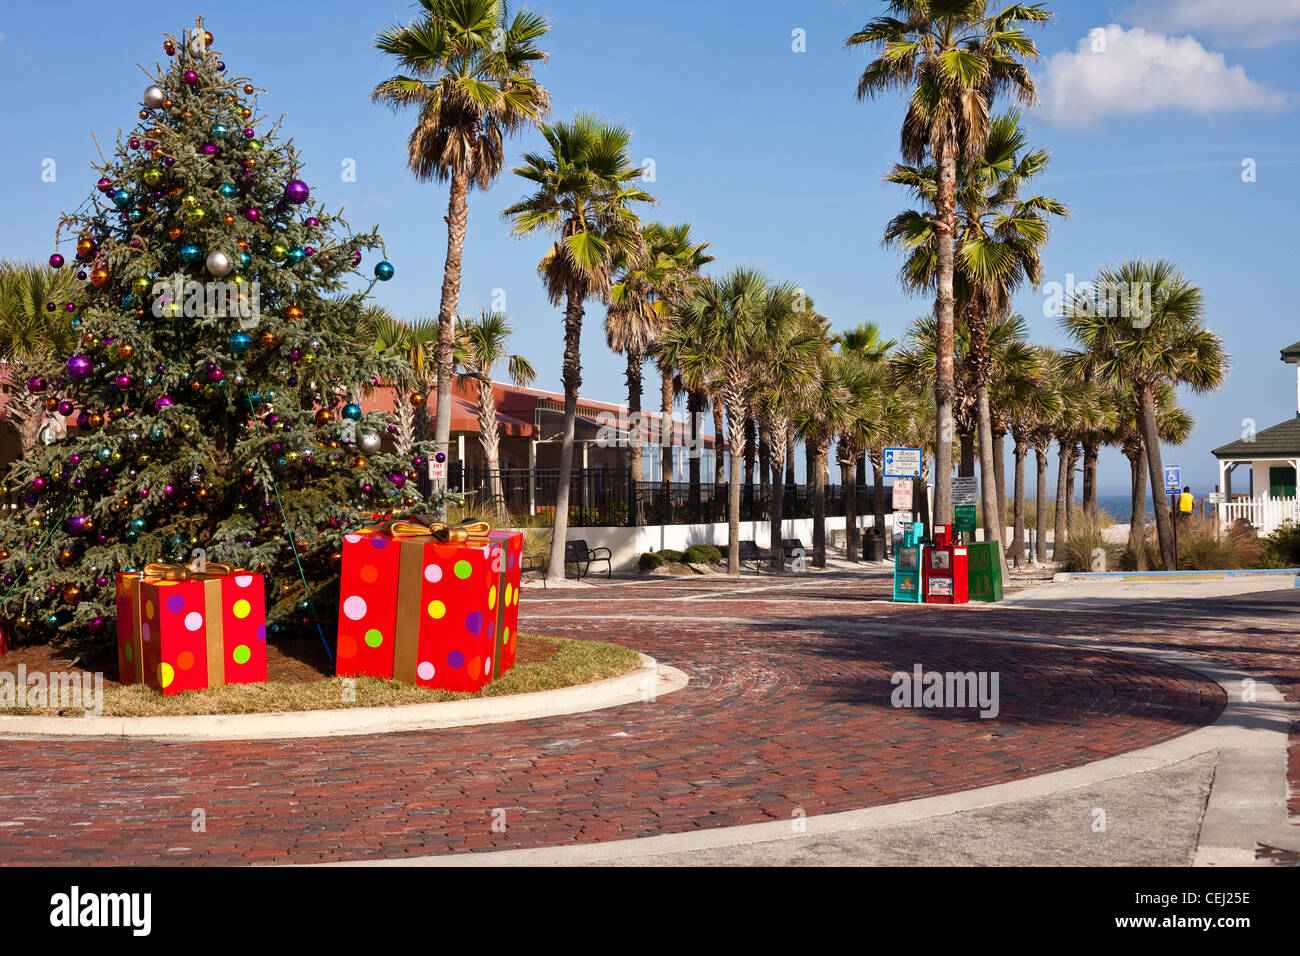 Christmas tree at vero beach florida Stock Photo, Royalty Free ...